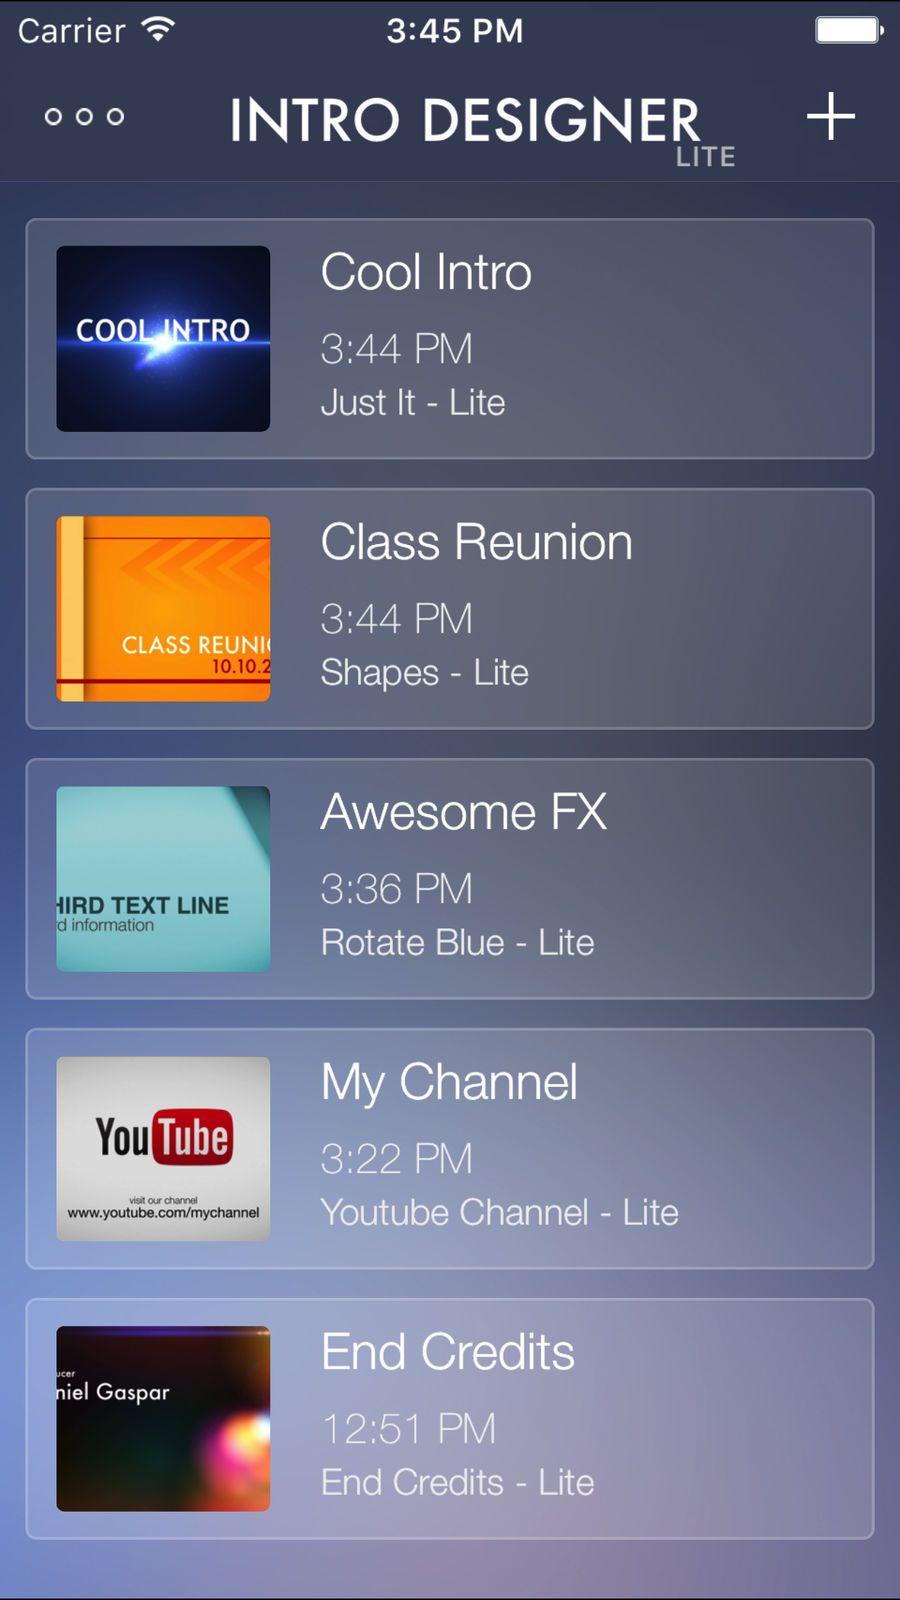 Intro Designer Lite Create Intros For Imovie Mobile